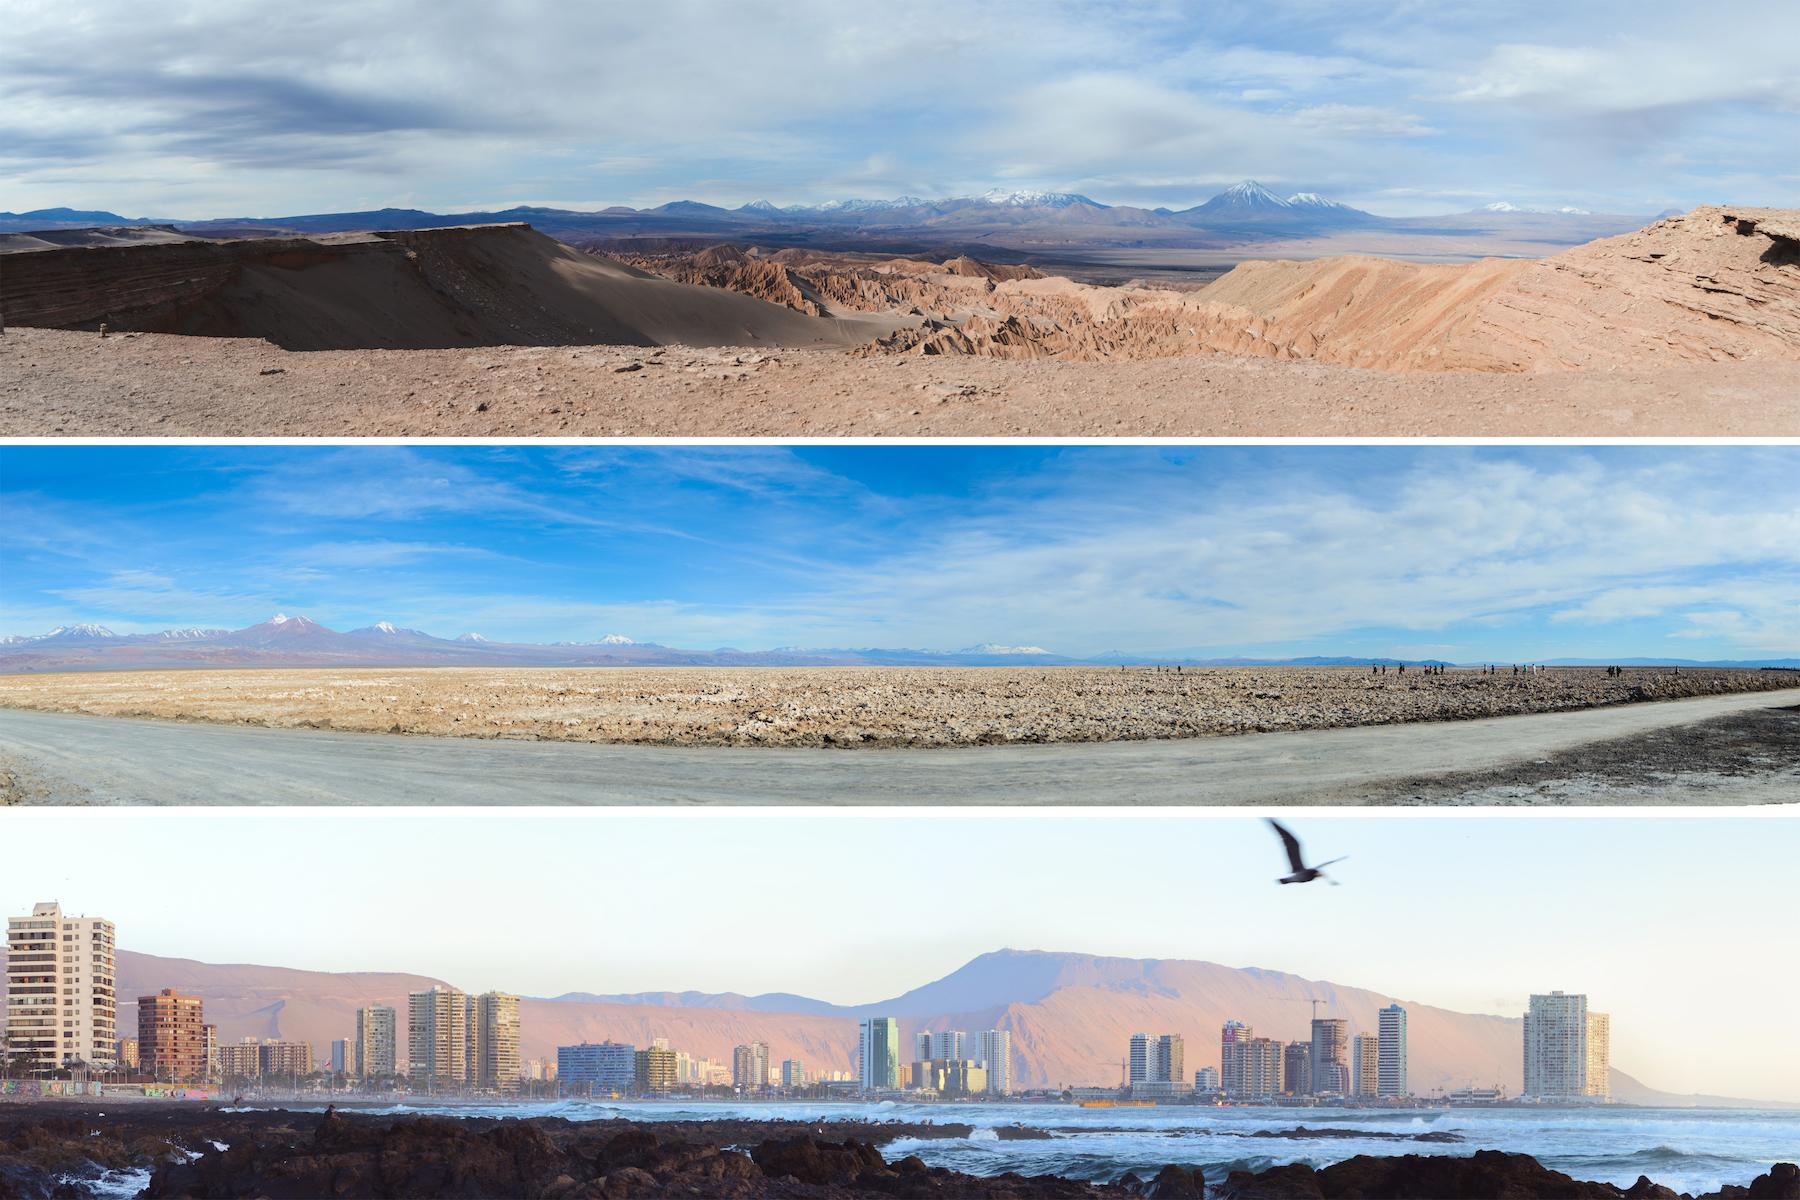 Atacama Desert (above) //Salt Flats (middle) // Iquique (bottom)